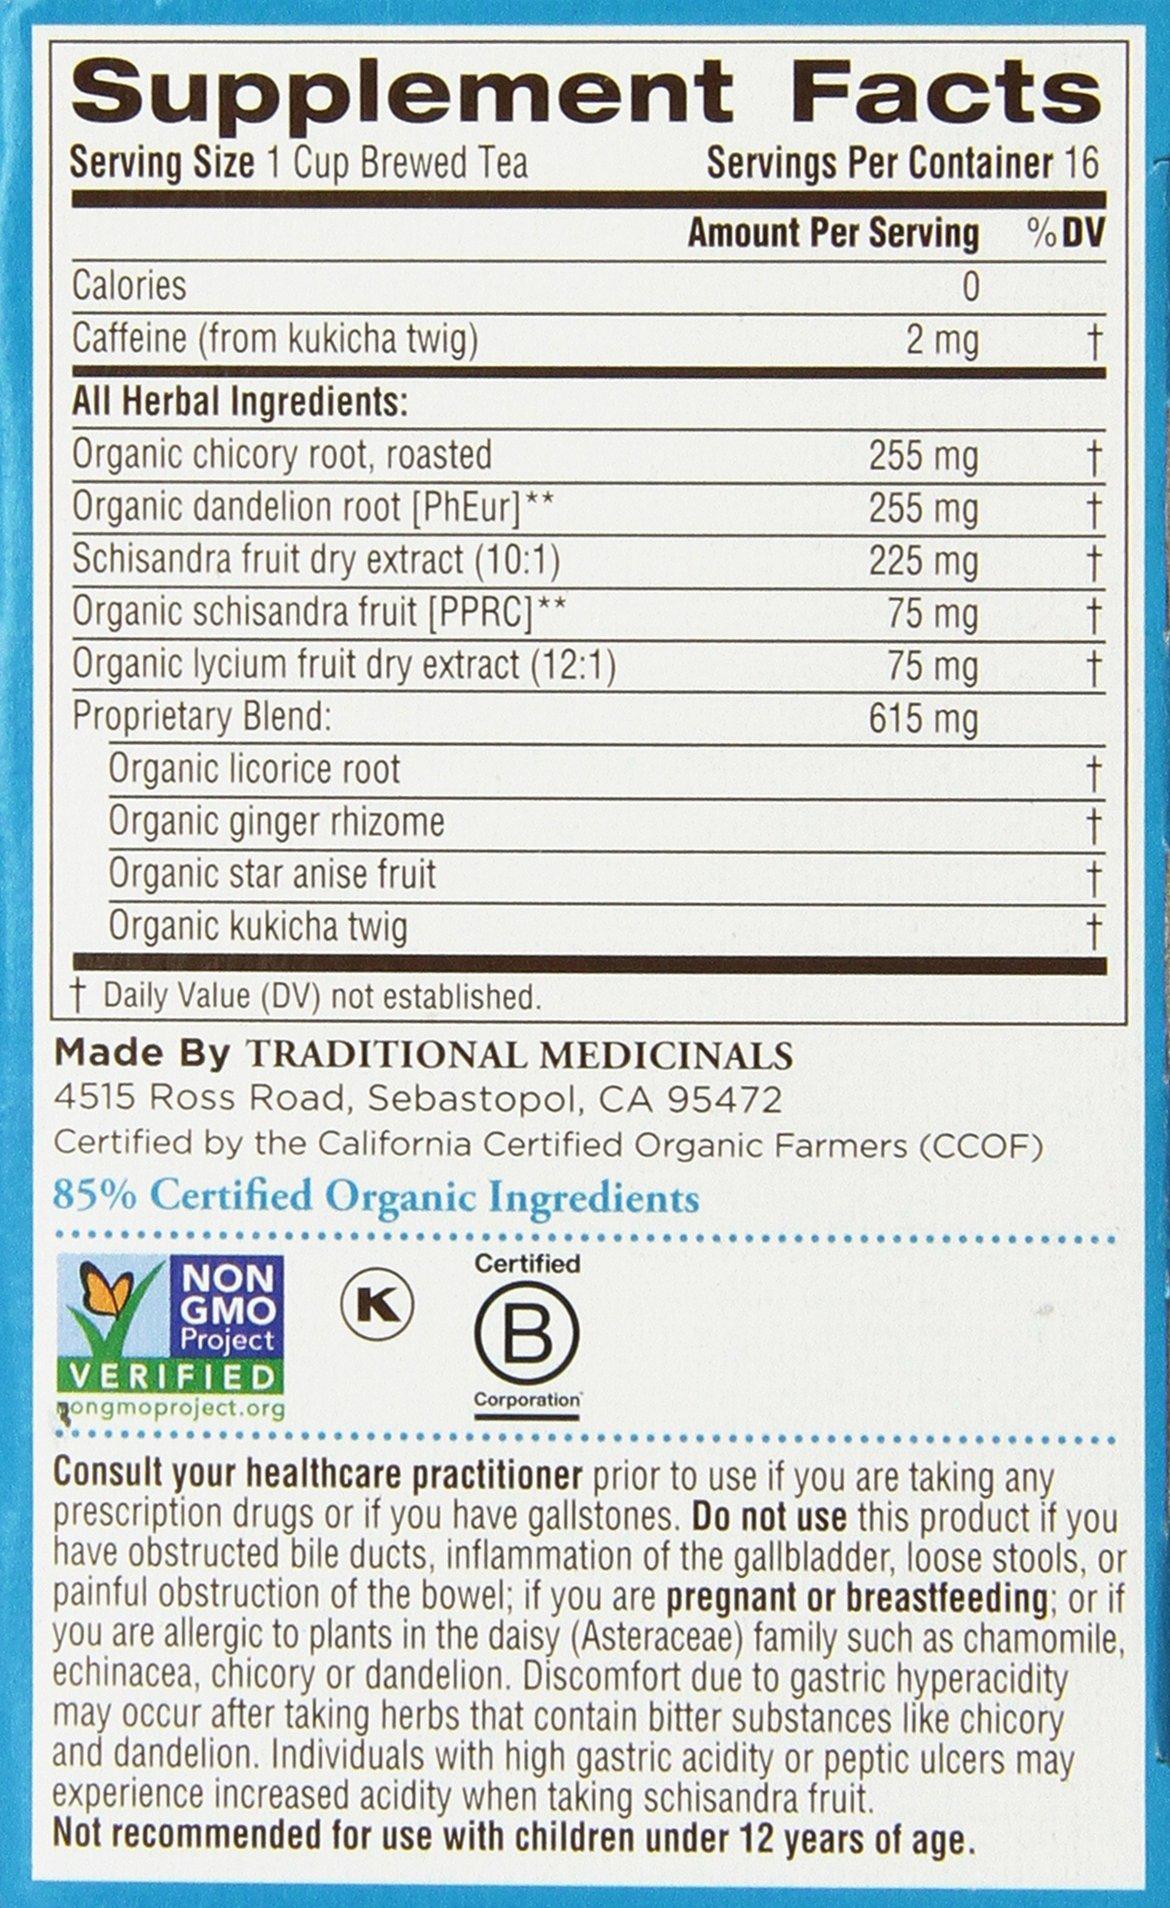 Traditional Medicinals Everyday Detox Herbal Wrapped Tea Bags - 16 ct - 2 pk by Traditional Medicinals